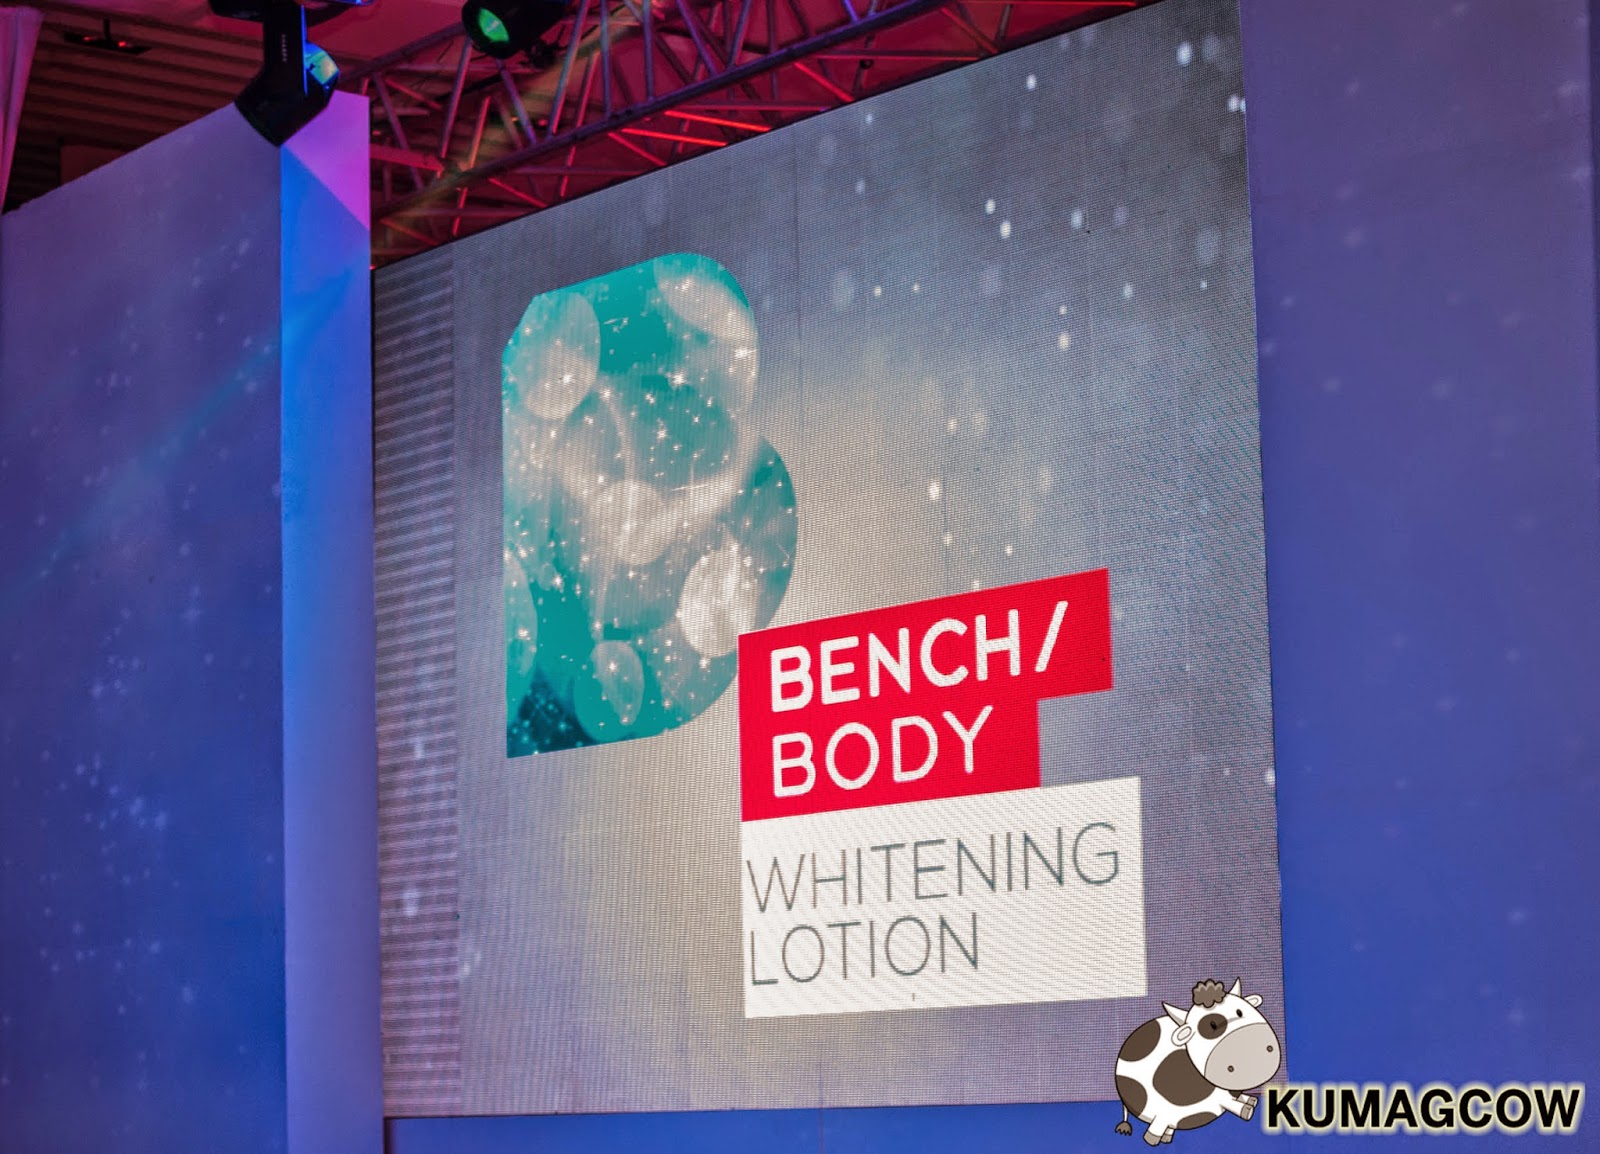 Surprising Bench Body Whitening Lotion Made With Nanobright Technology Uwap Interior Chair Design Uwaporg